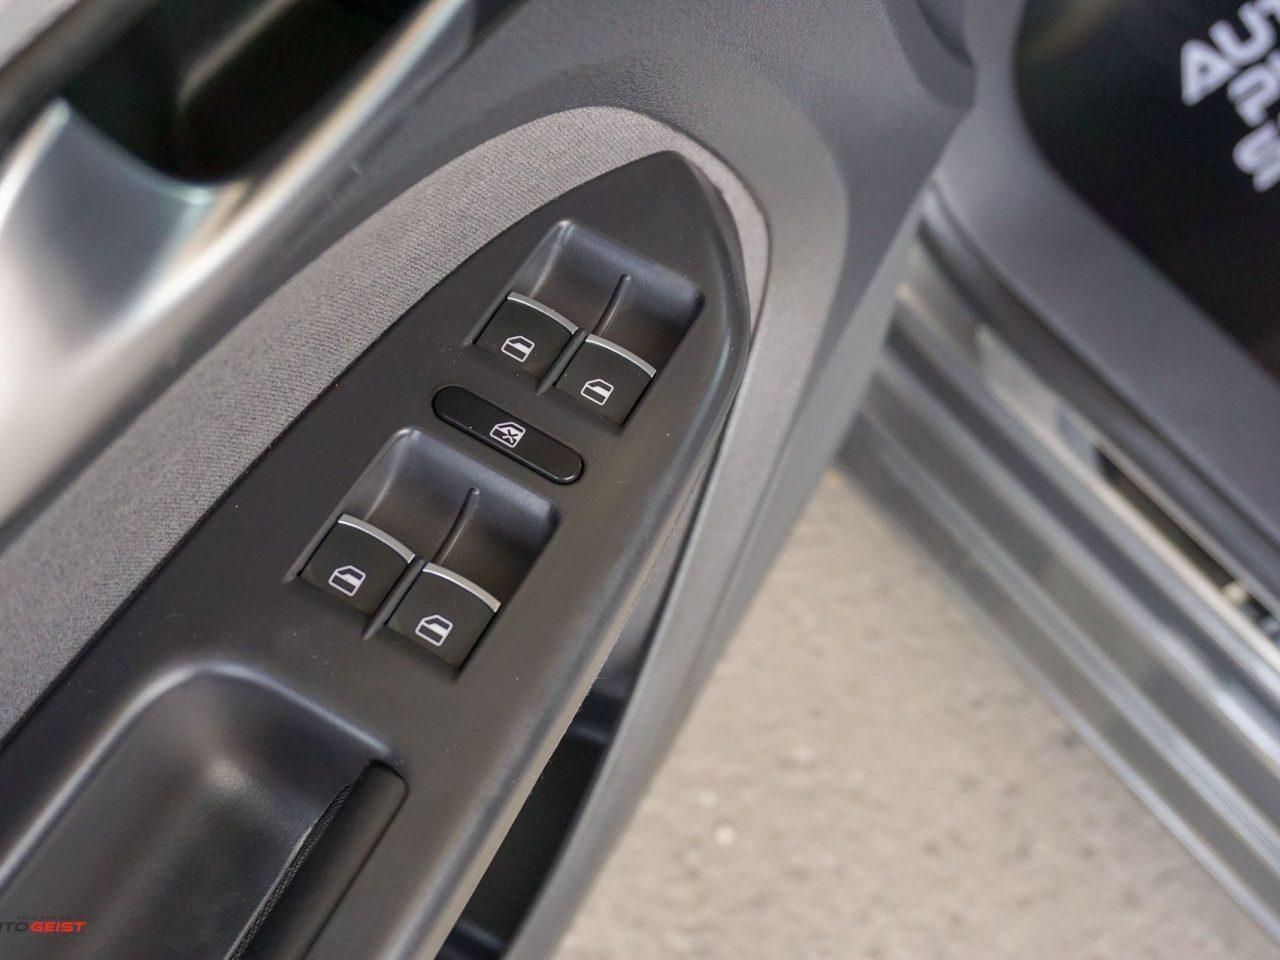 661-volkswagen-touran-gri-manual-01830